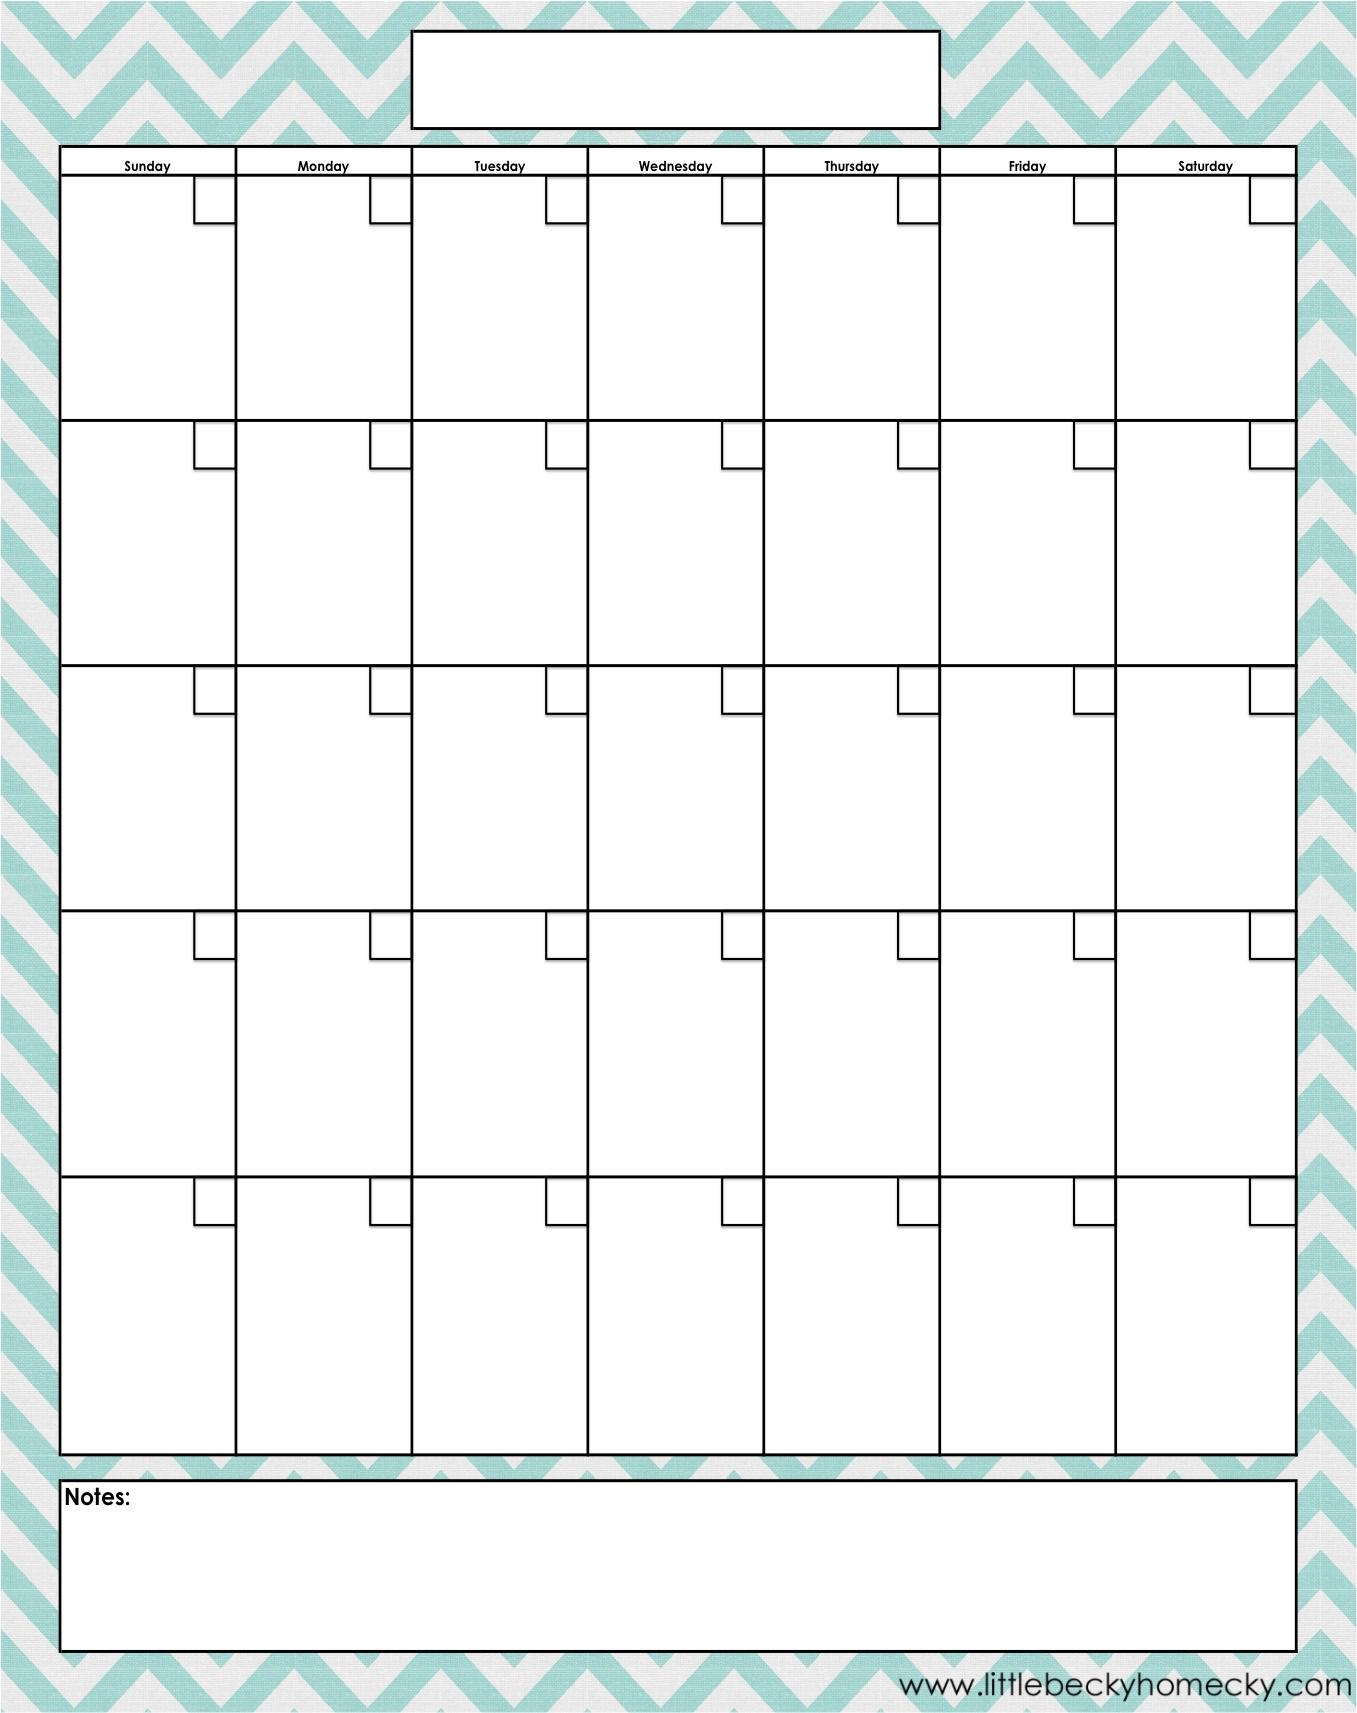 Blank Monthly Calendar Printable Free | 2020Calendartemplates